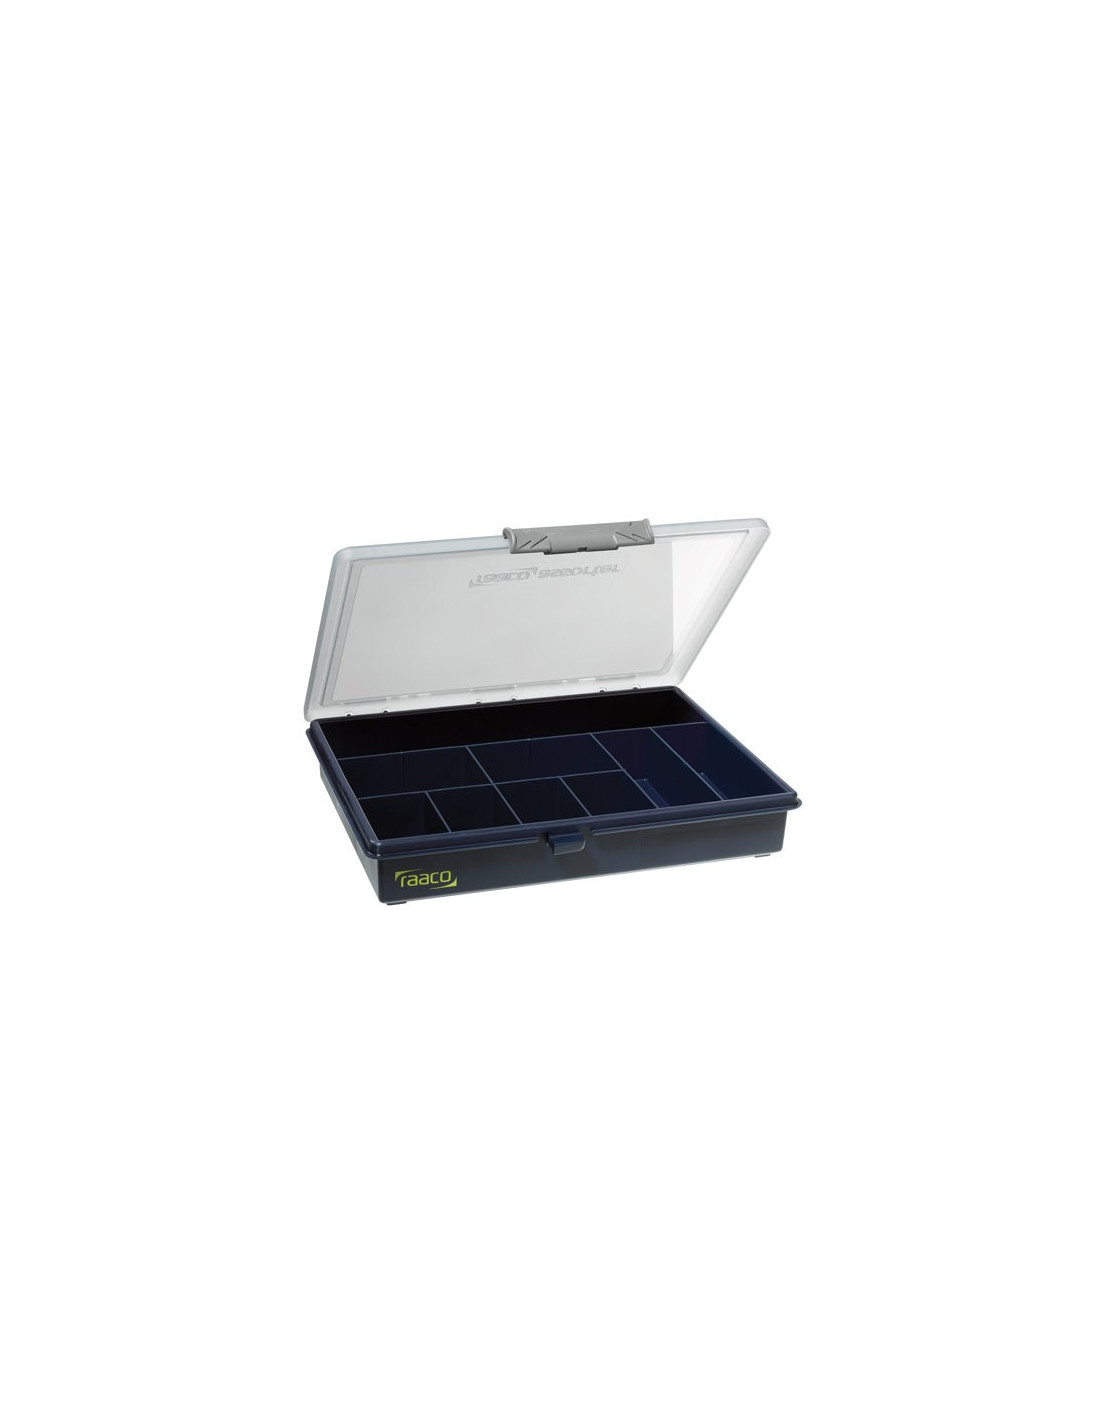 Raaco boite rangement casier a9 hyper brico - Casier rangement visserie ...